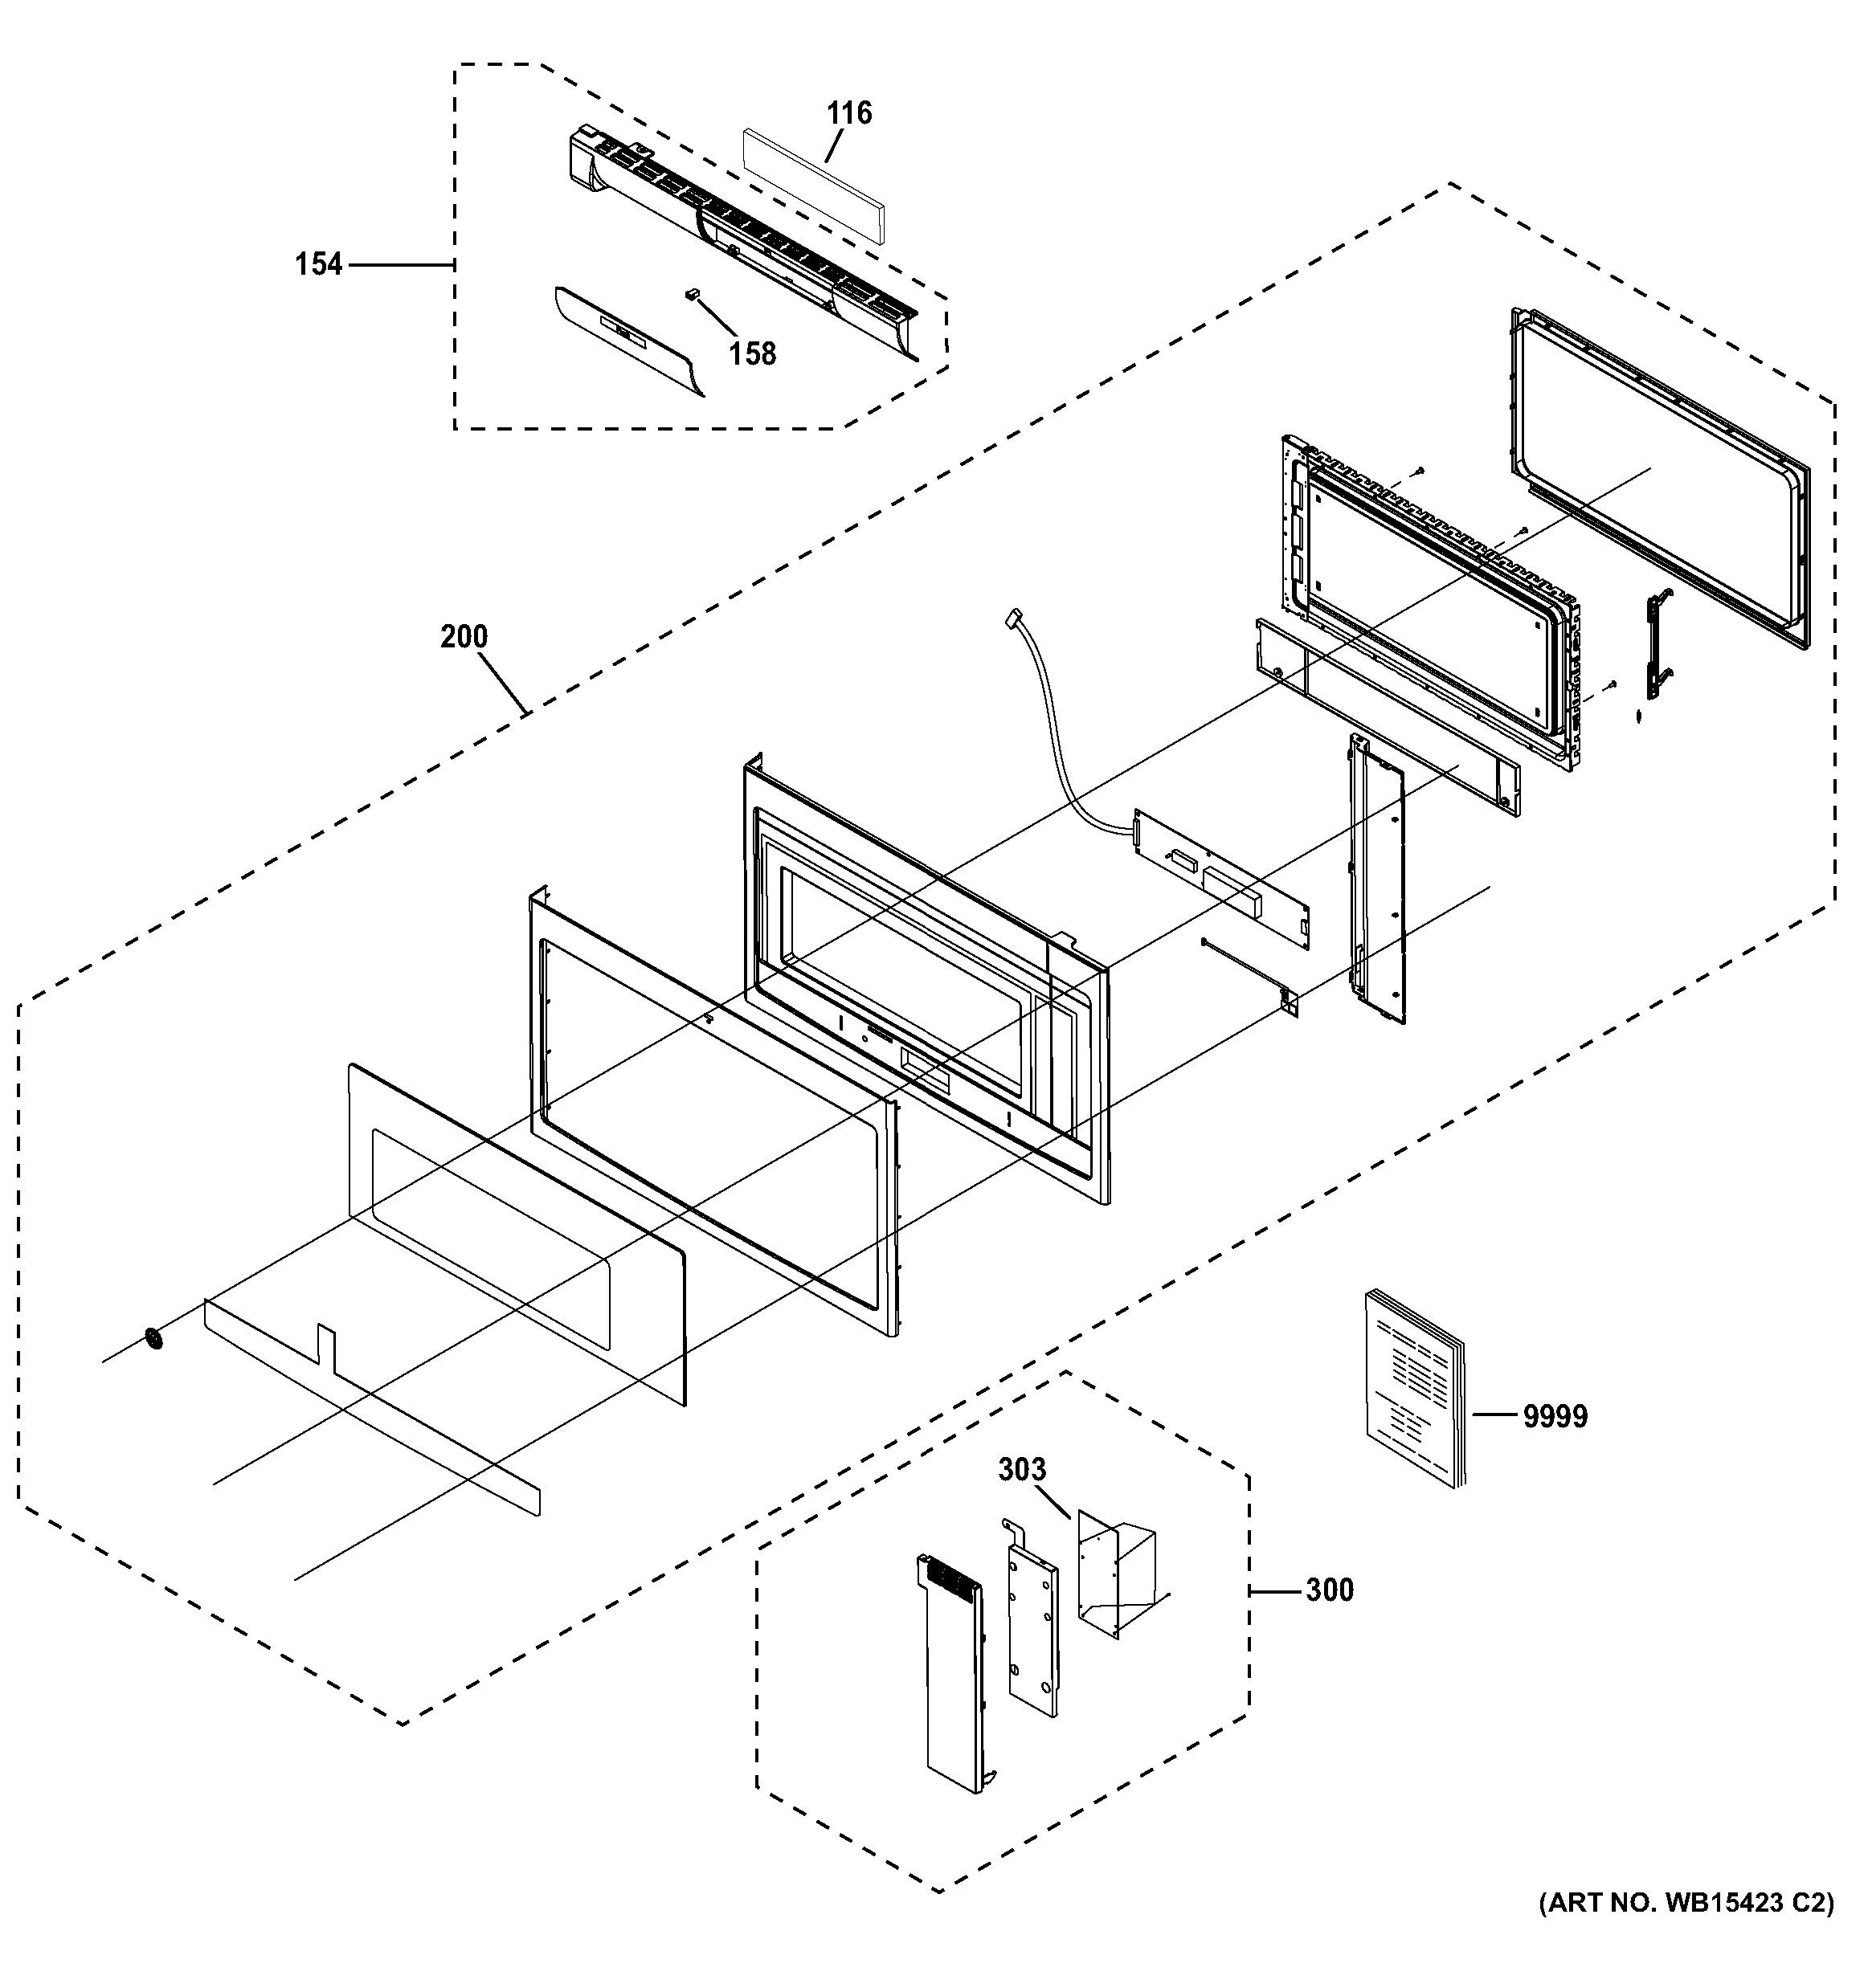 lincoln electric welder parts diagram ezgo golf cart wiring miller 250 mig imageresizertool com